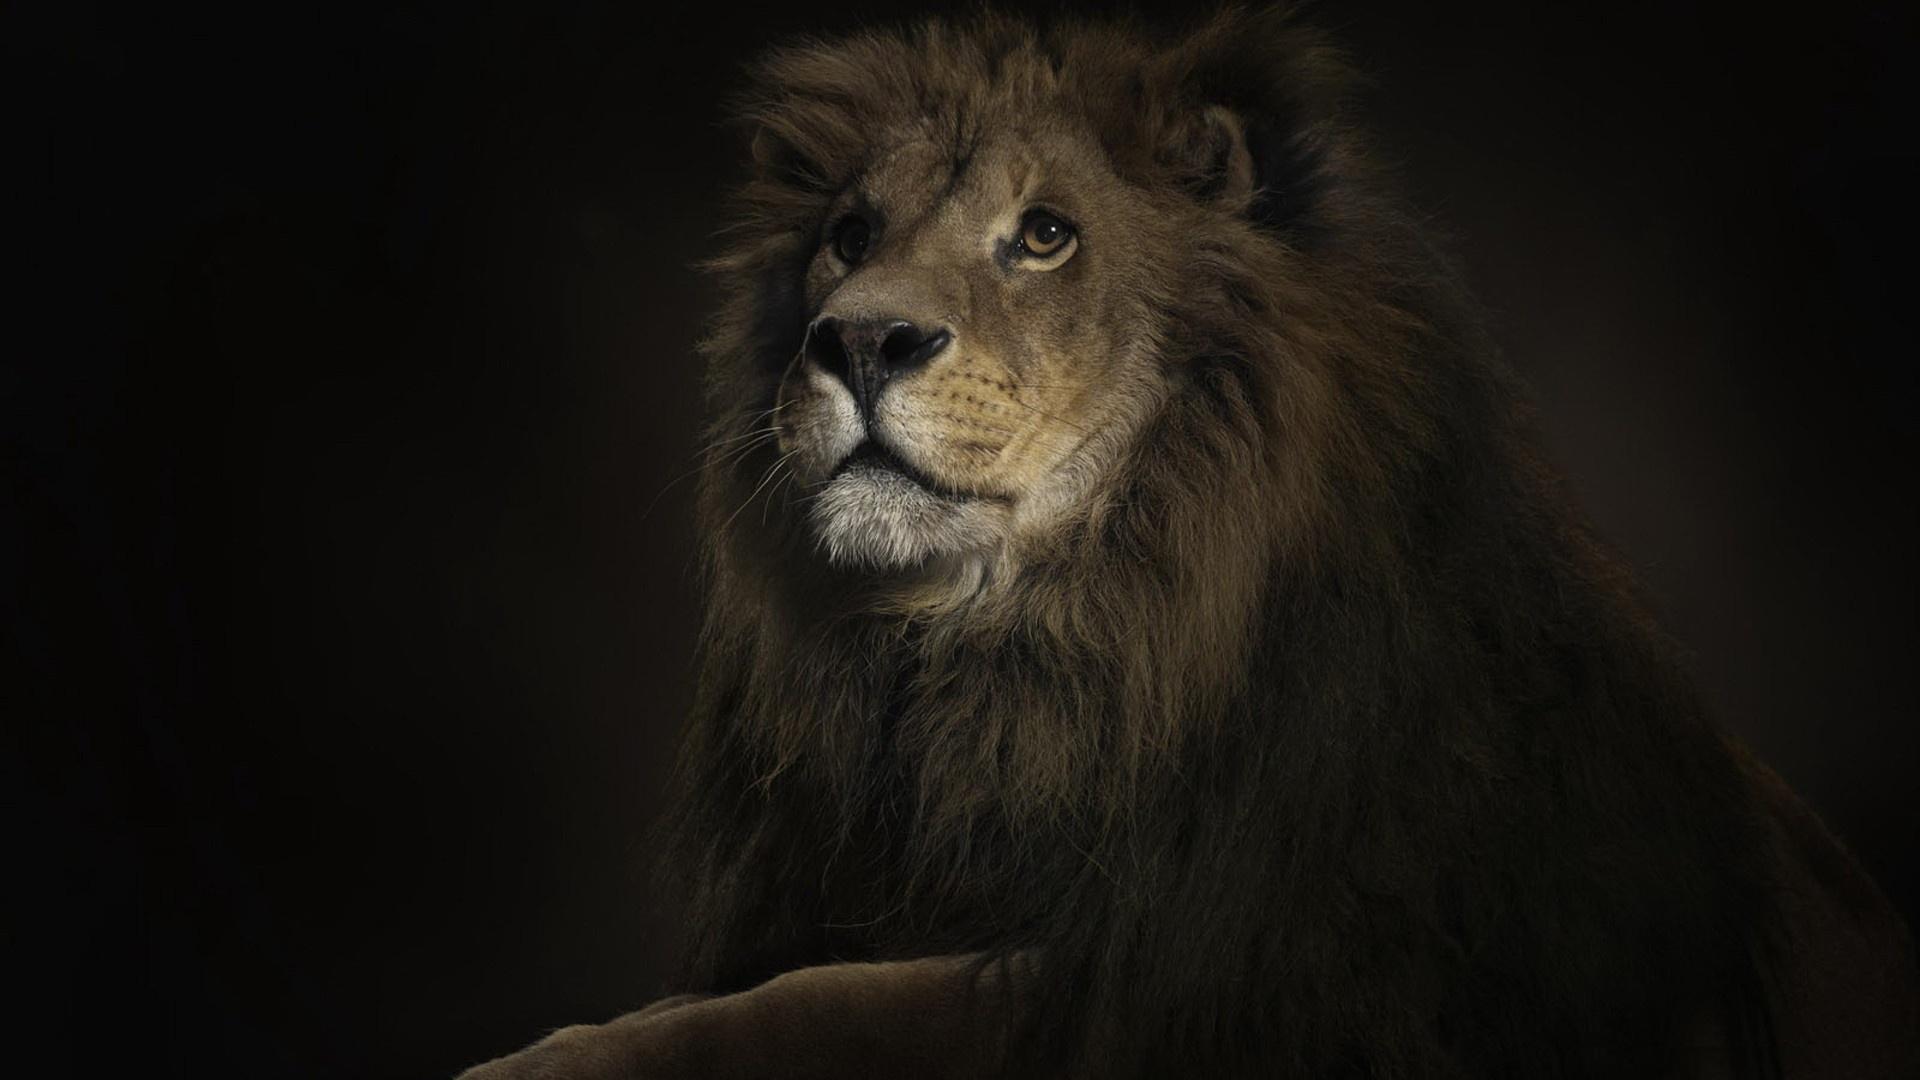 lion wallpapers hd - wallpapersafari